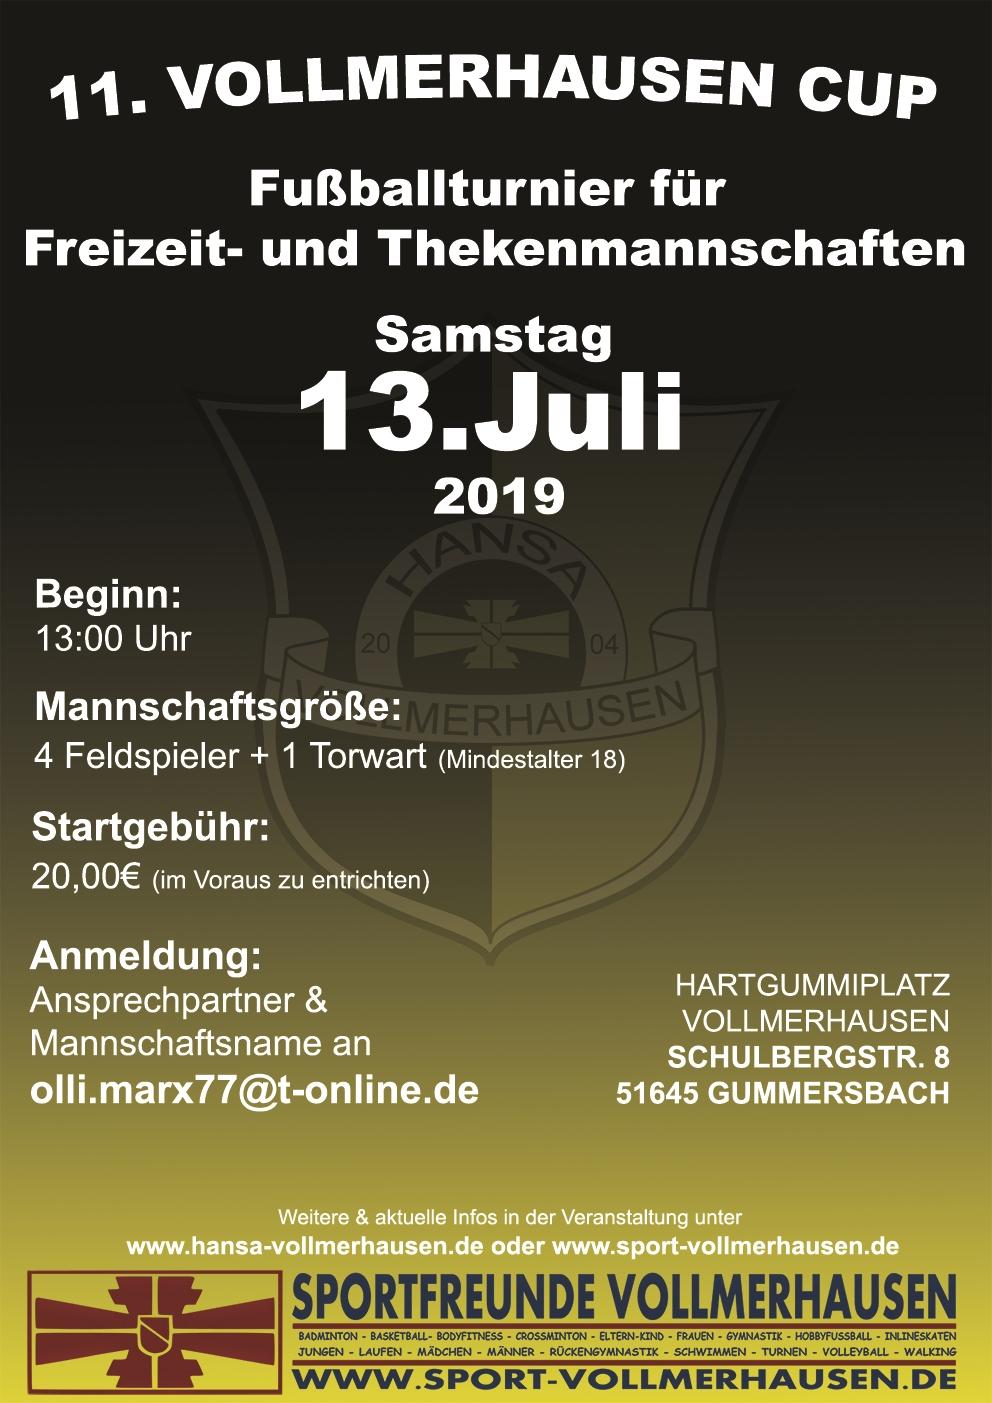 Fyler_11_vollmerhausencup